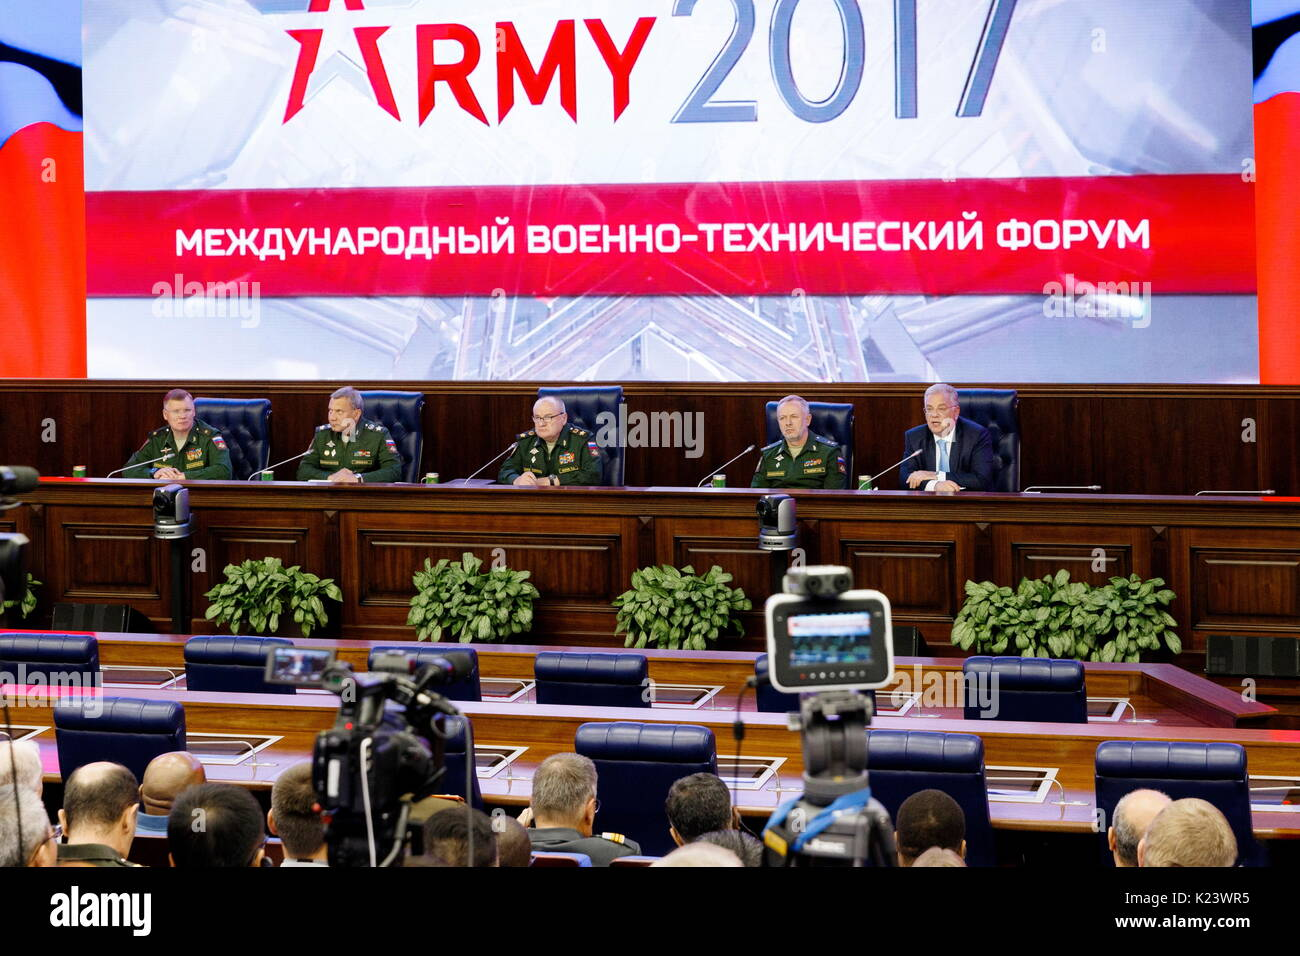 Moscow, Russia. 30th Aug, 2017. Russia's Defence Ministry Spokesman Igor Konashenkov, Russia's Deputy Defence - Stock Image